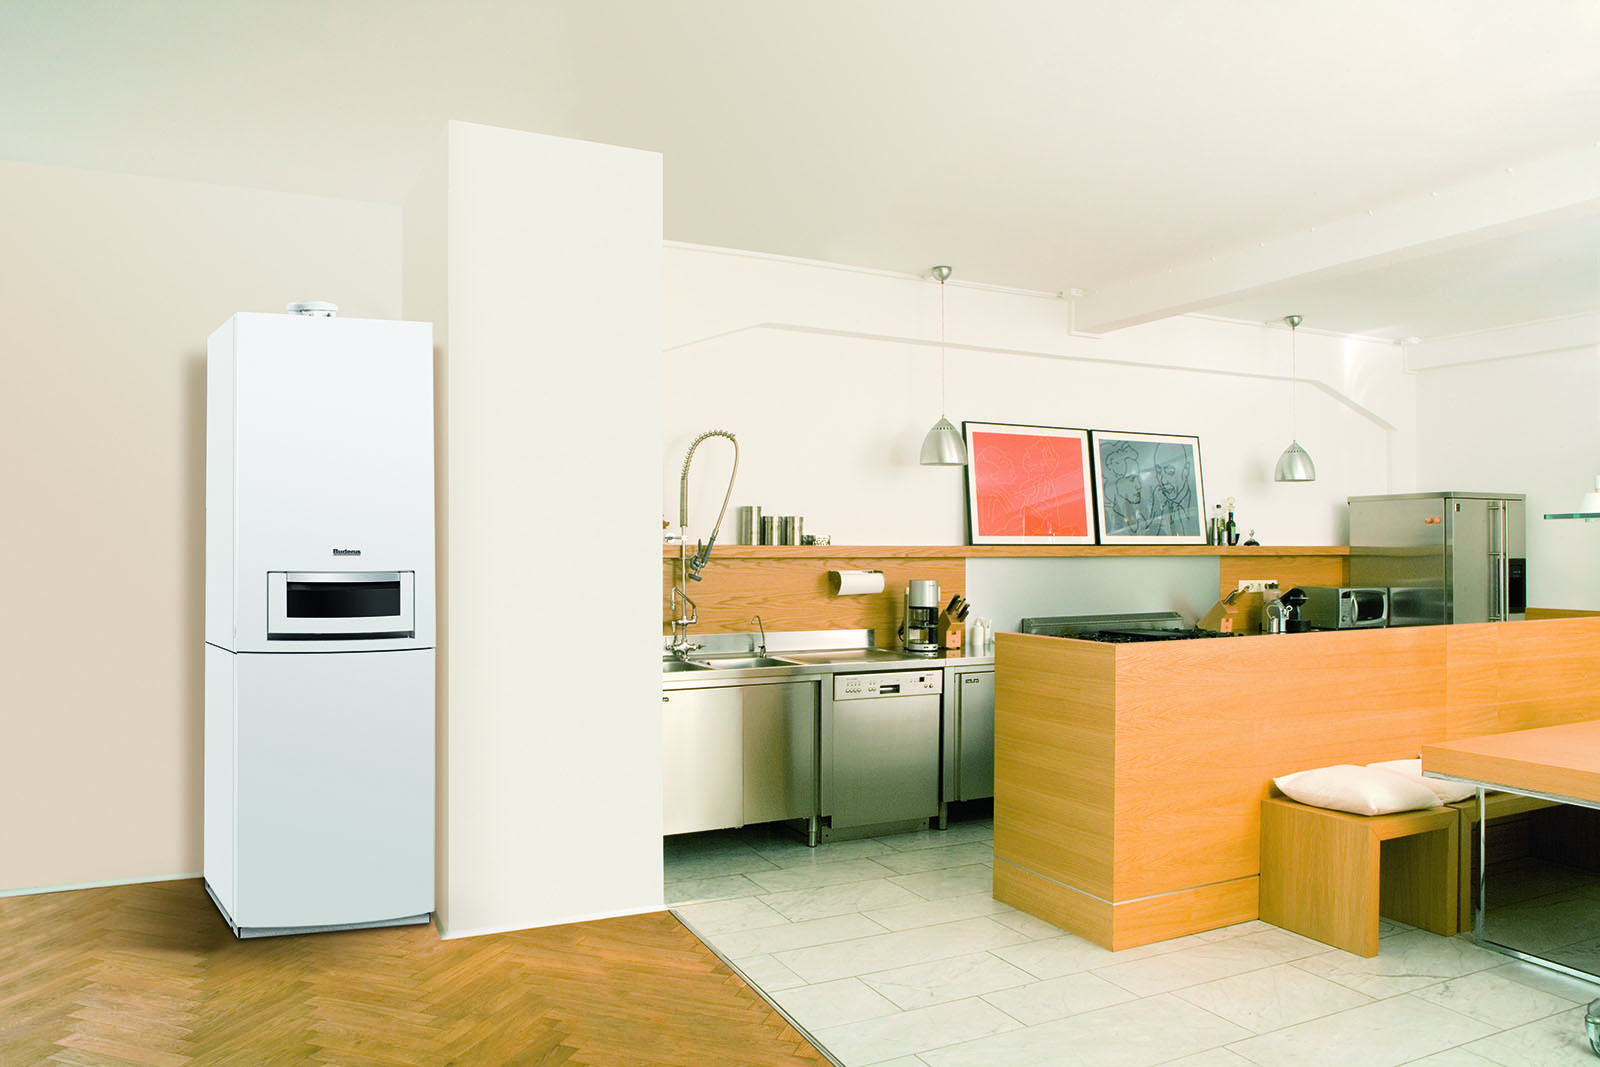 innovative heiztechnik mko gmbh luxemburg. Black Bedroom Furniture Sets. Home Design Ideas